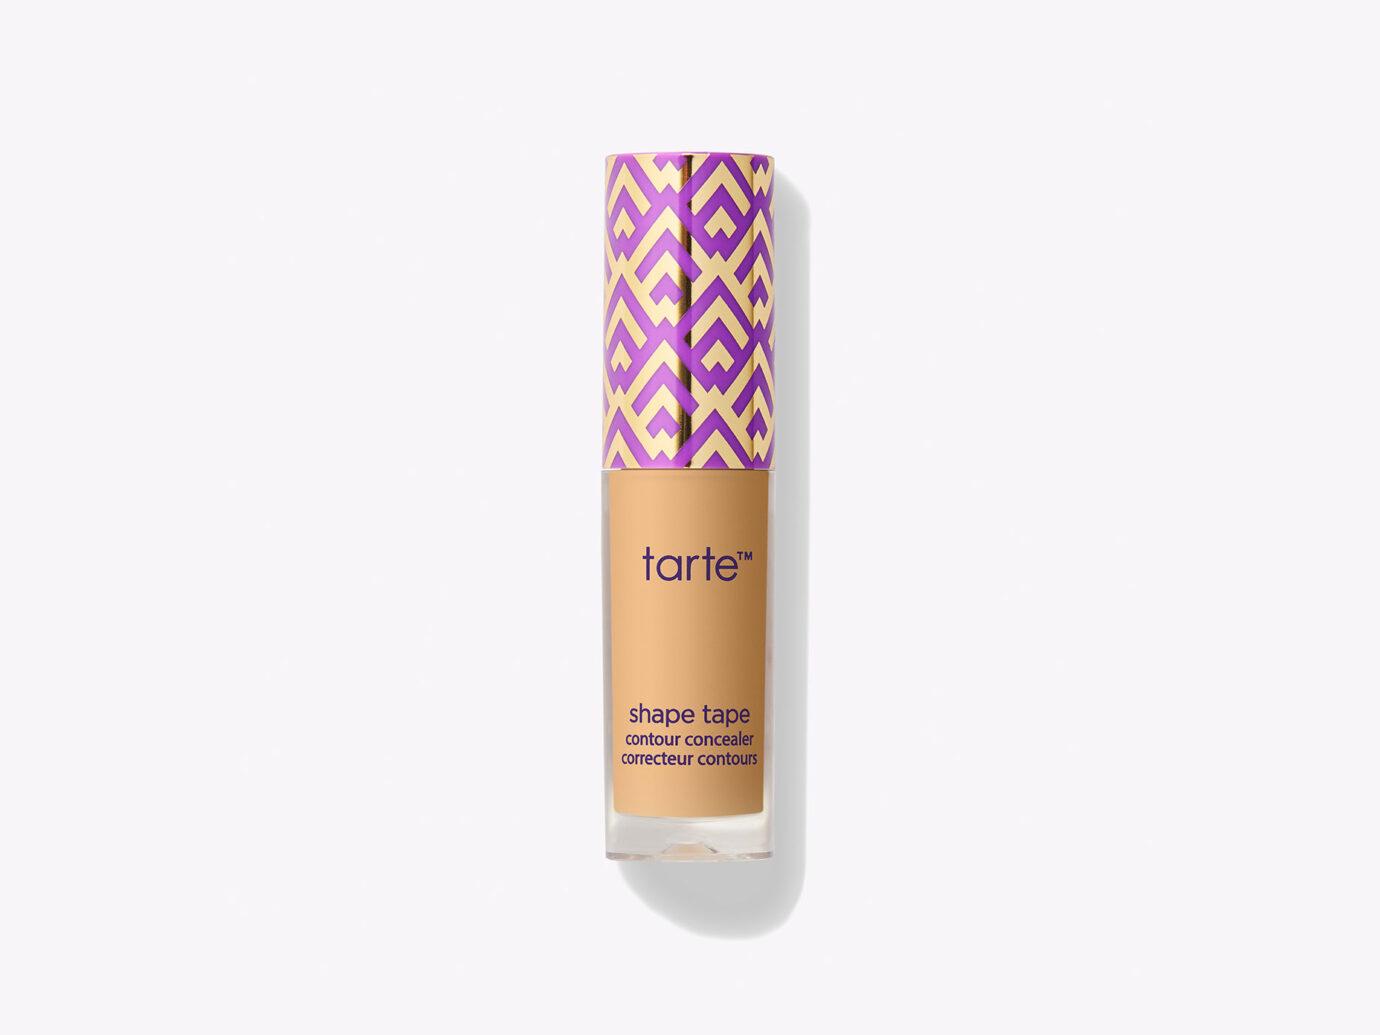 Tarte Travel Size Shape Tape Contour Concealer